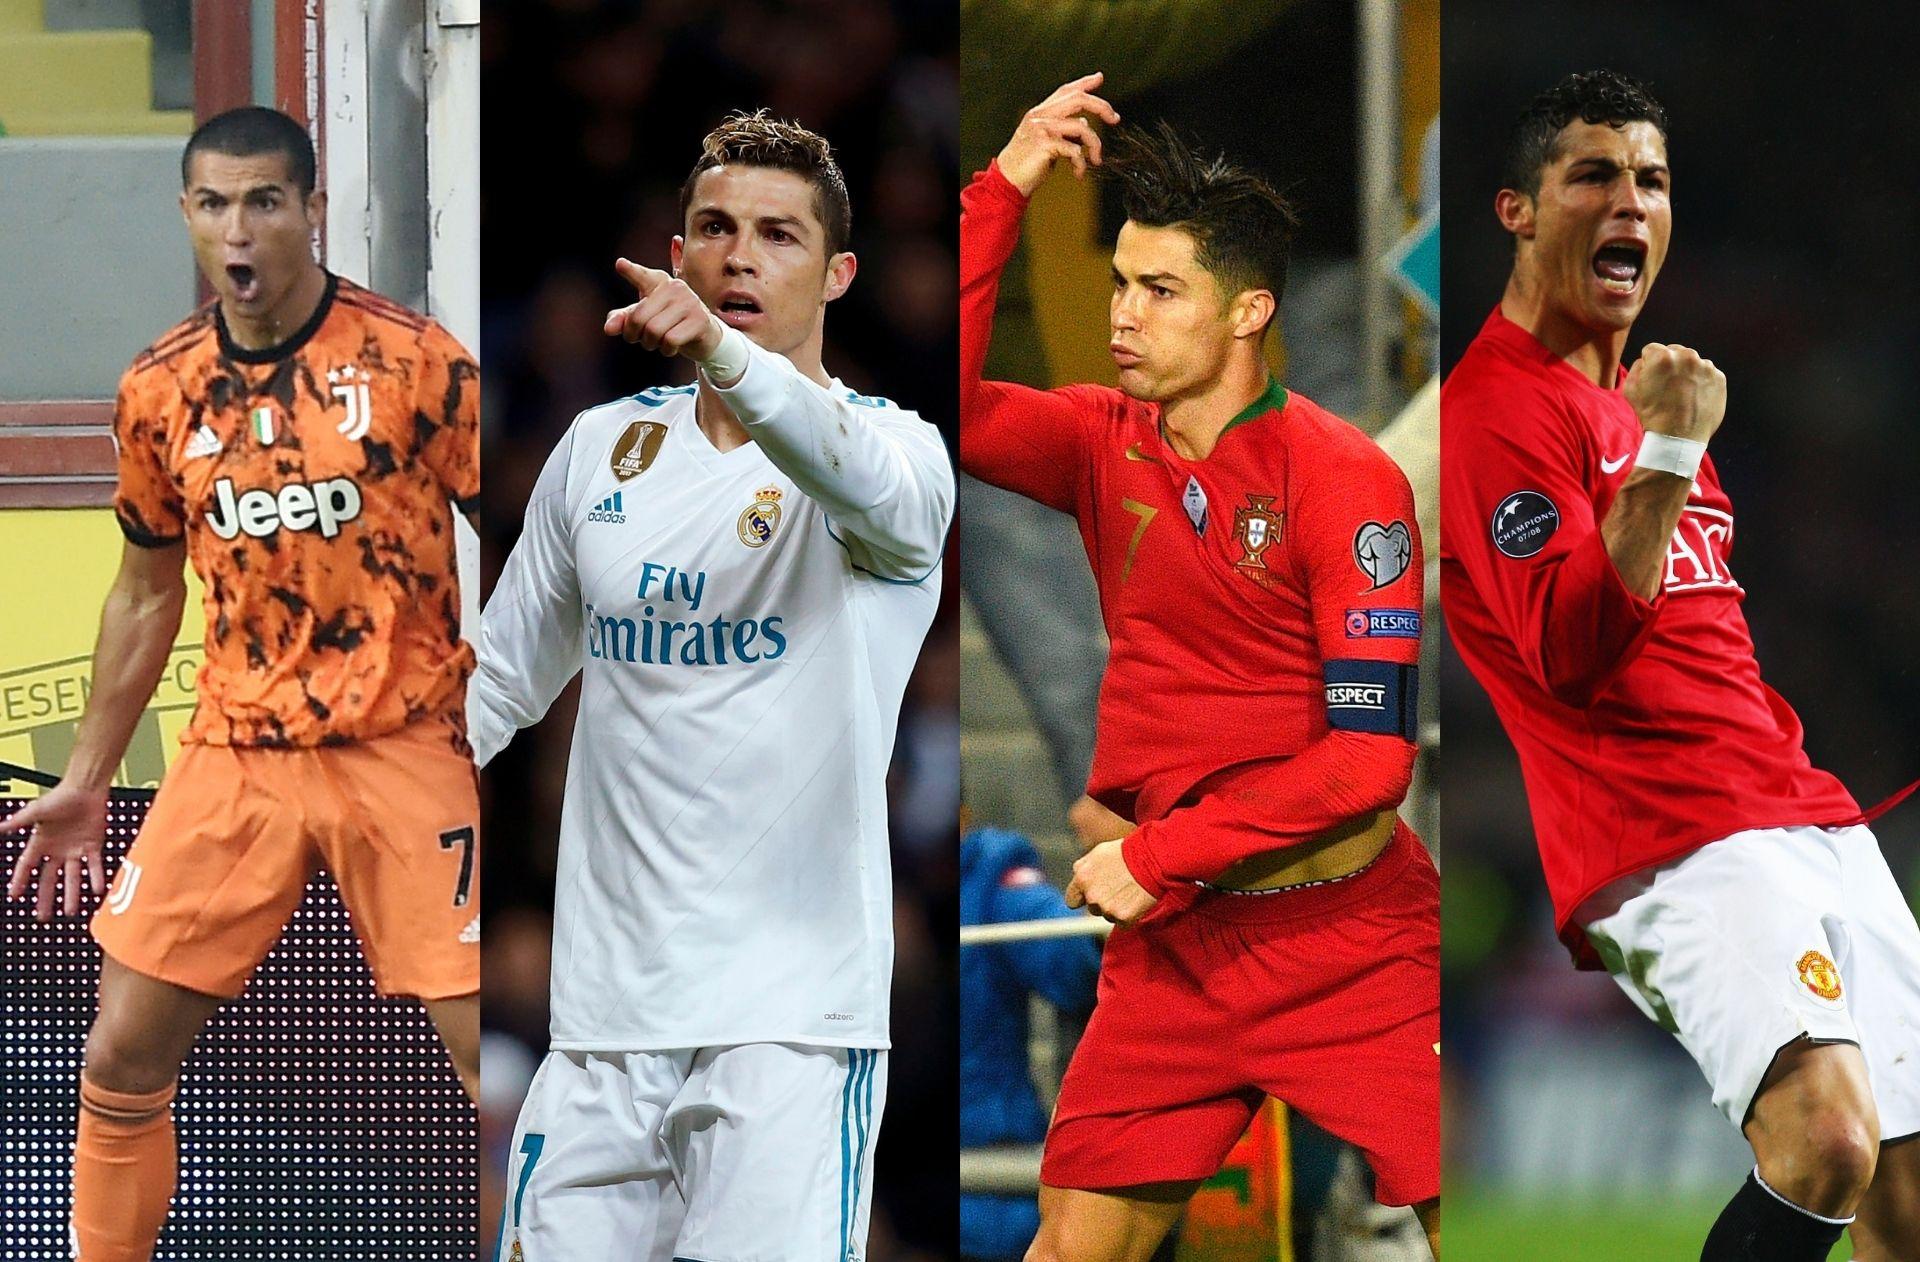 Cristiano Ronaldo - Juventus, Real Madrid, Portugal, Manchester United